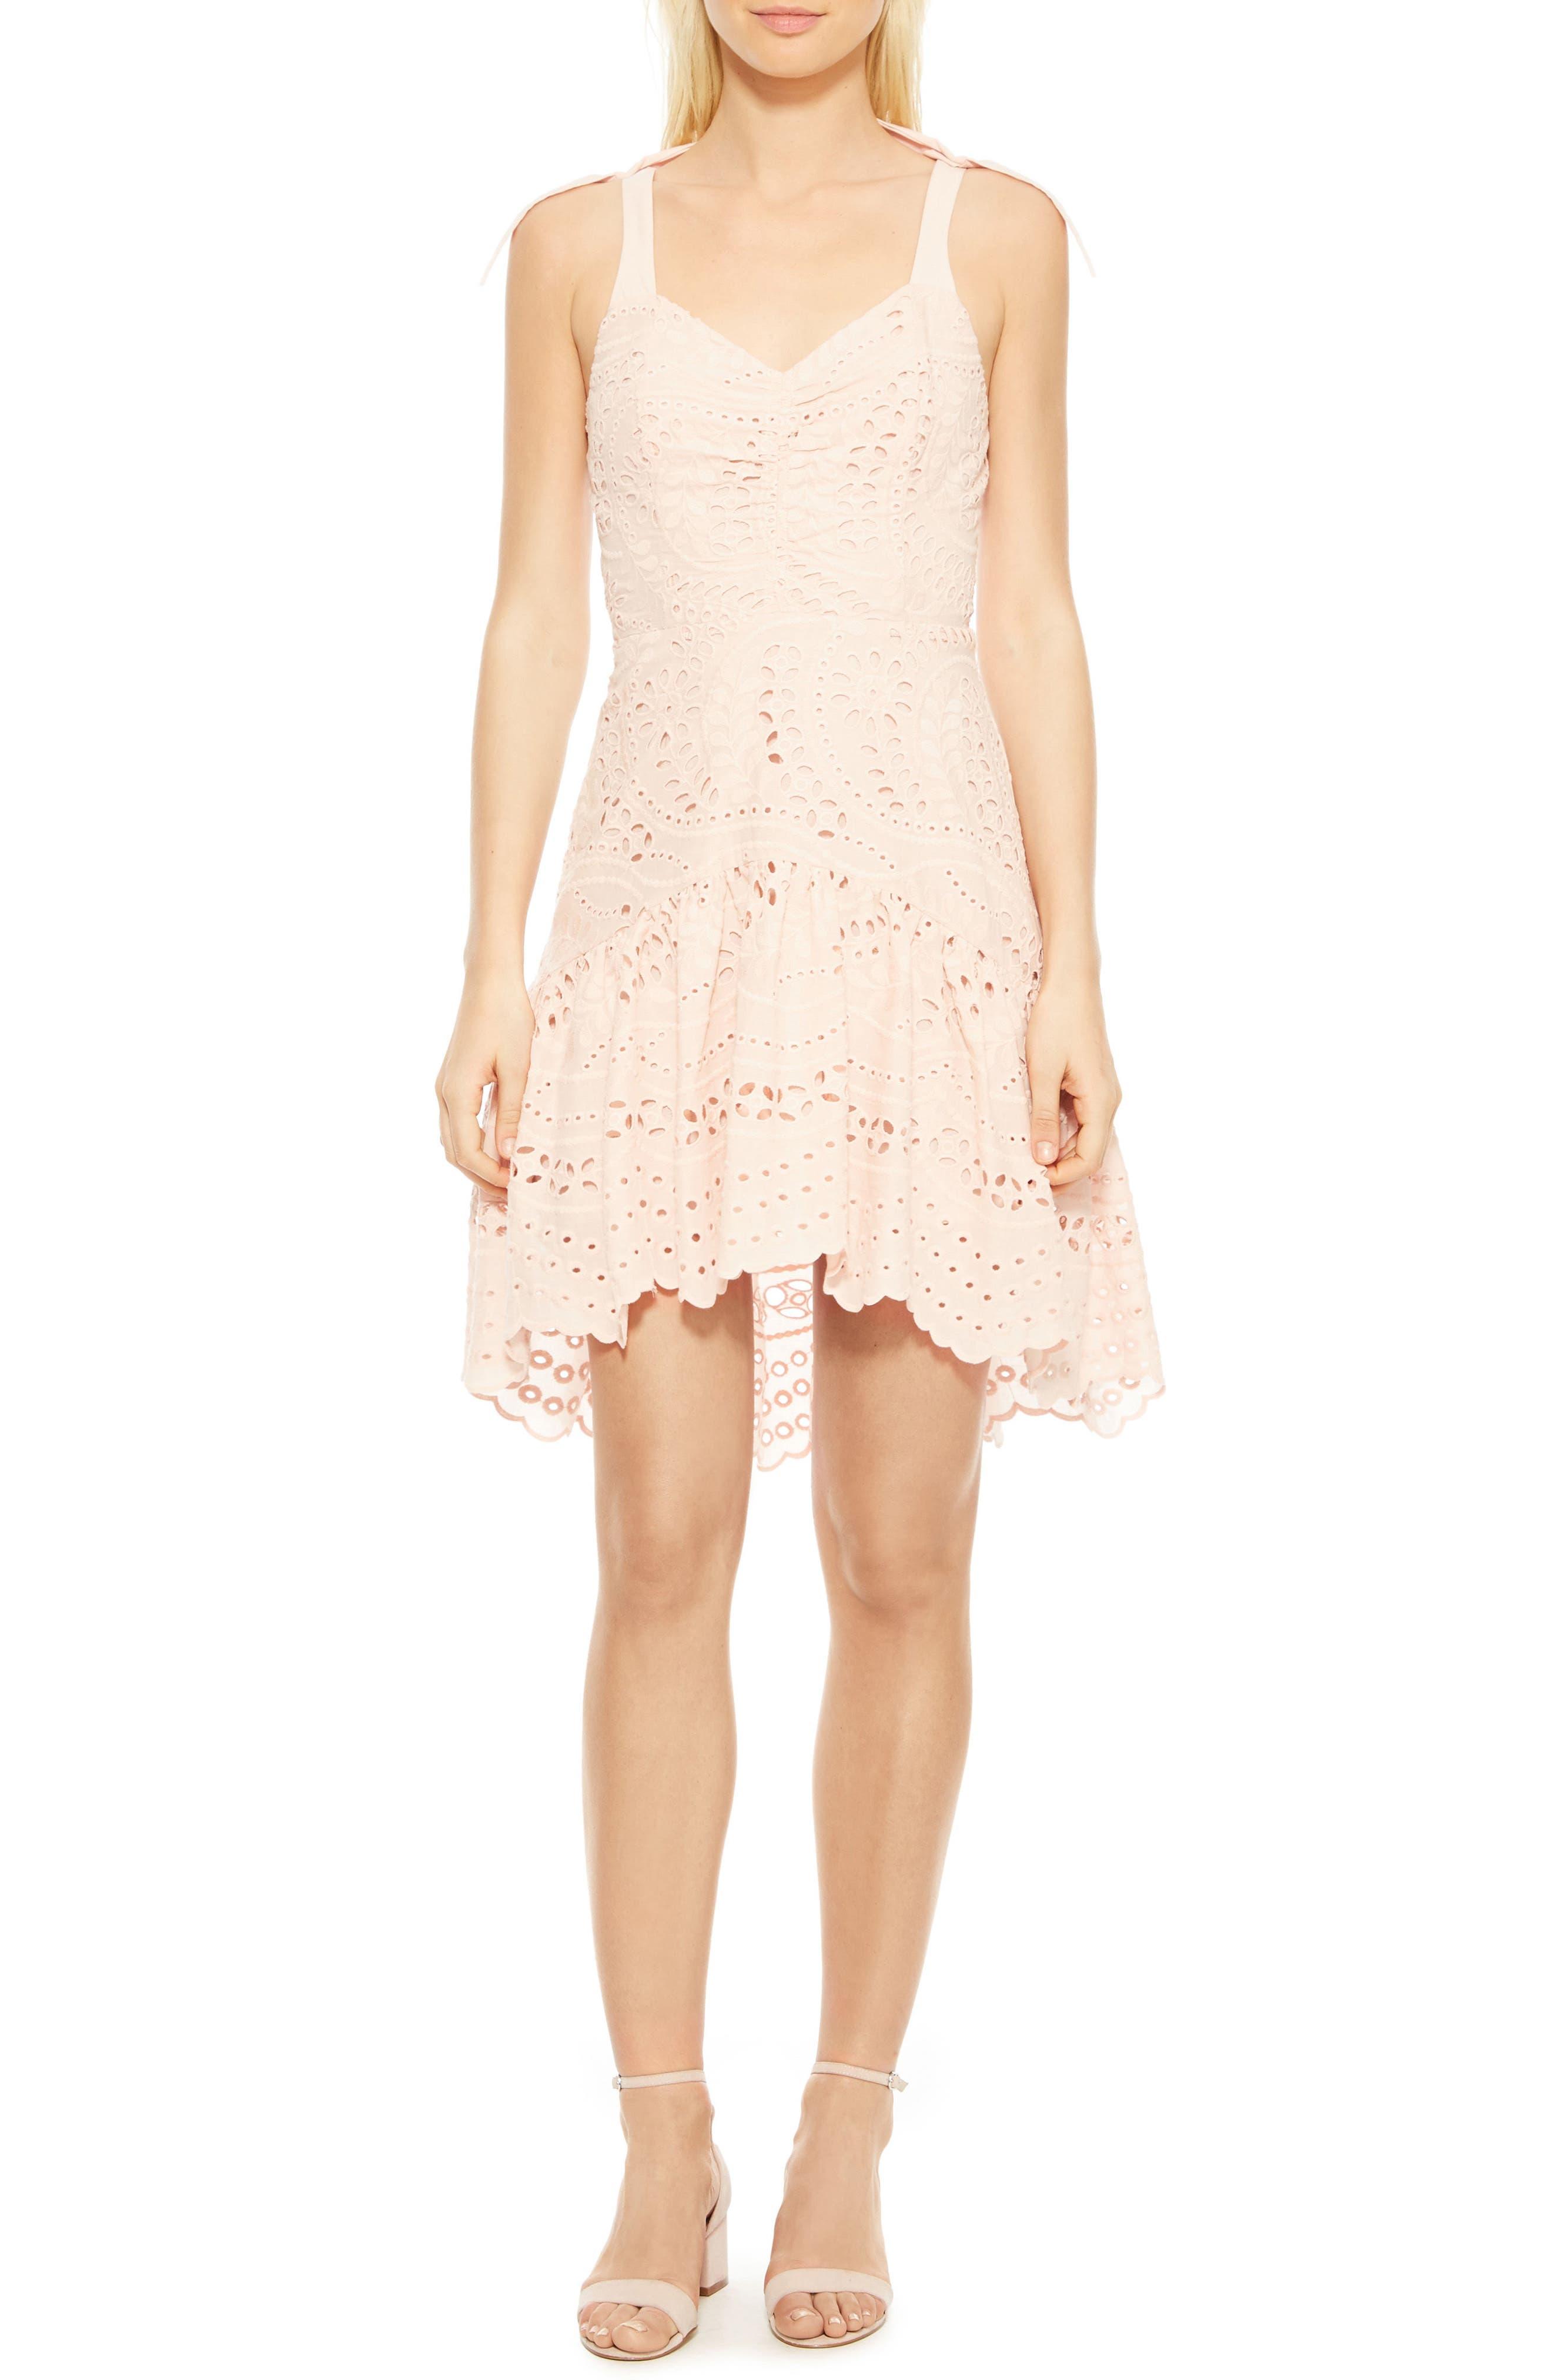 Odysseia Eyelet Cotton Dress,                         Main,                         color, Pearl Blush